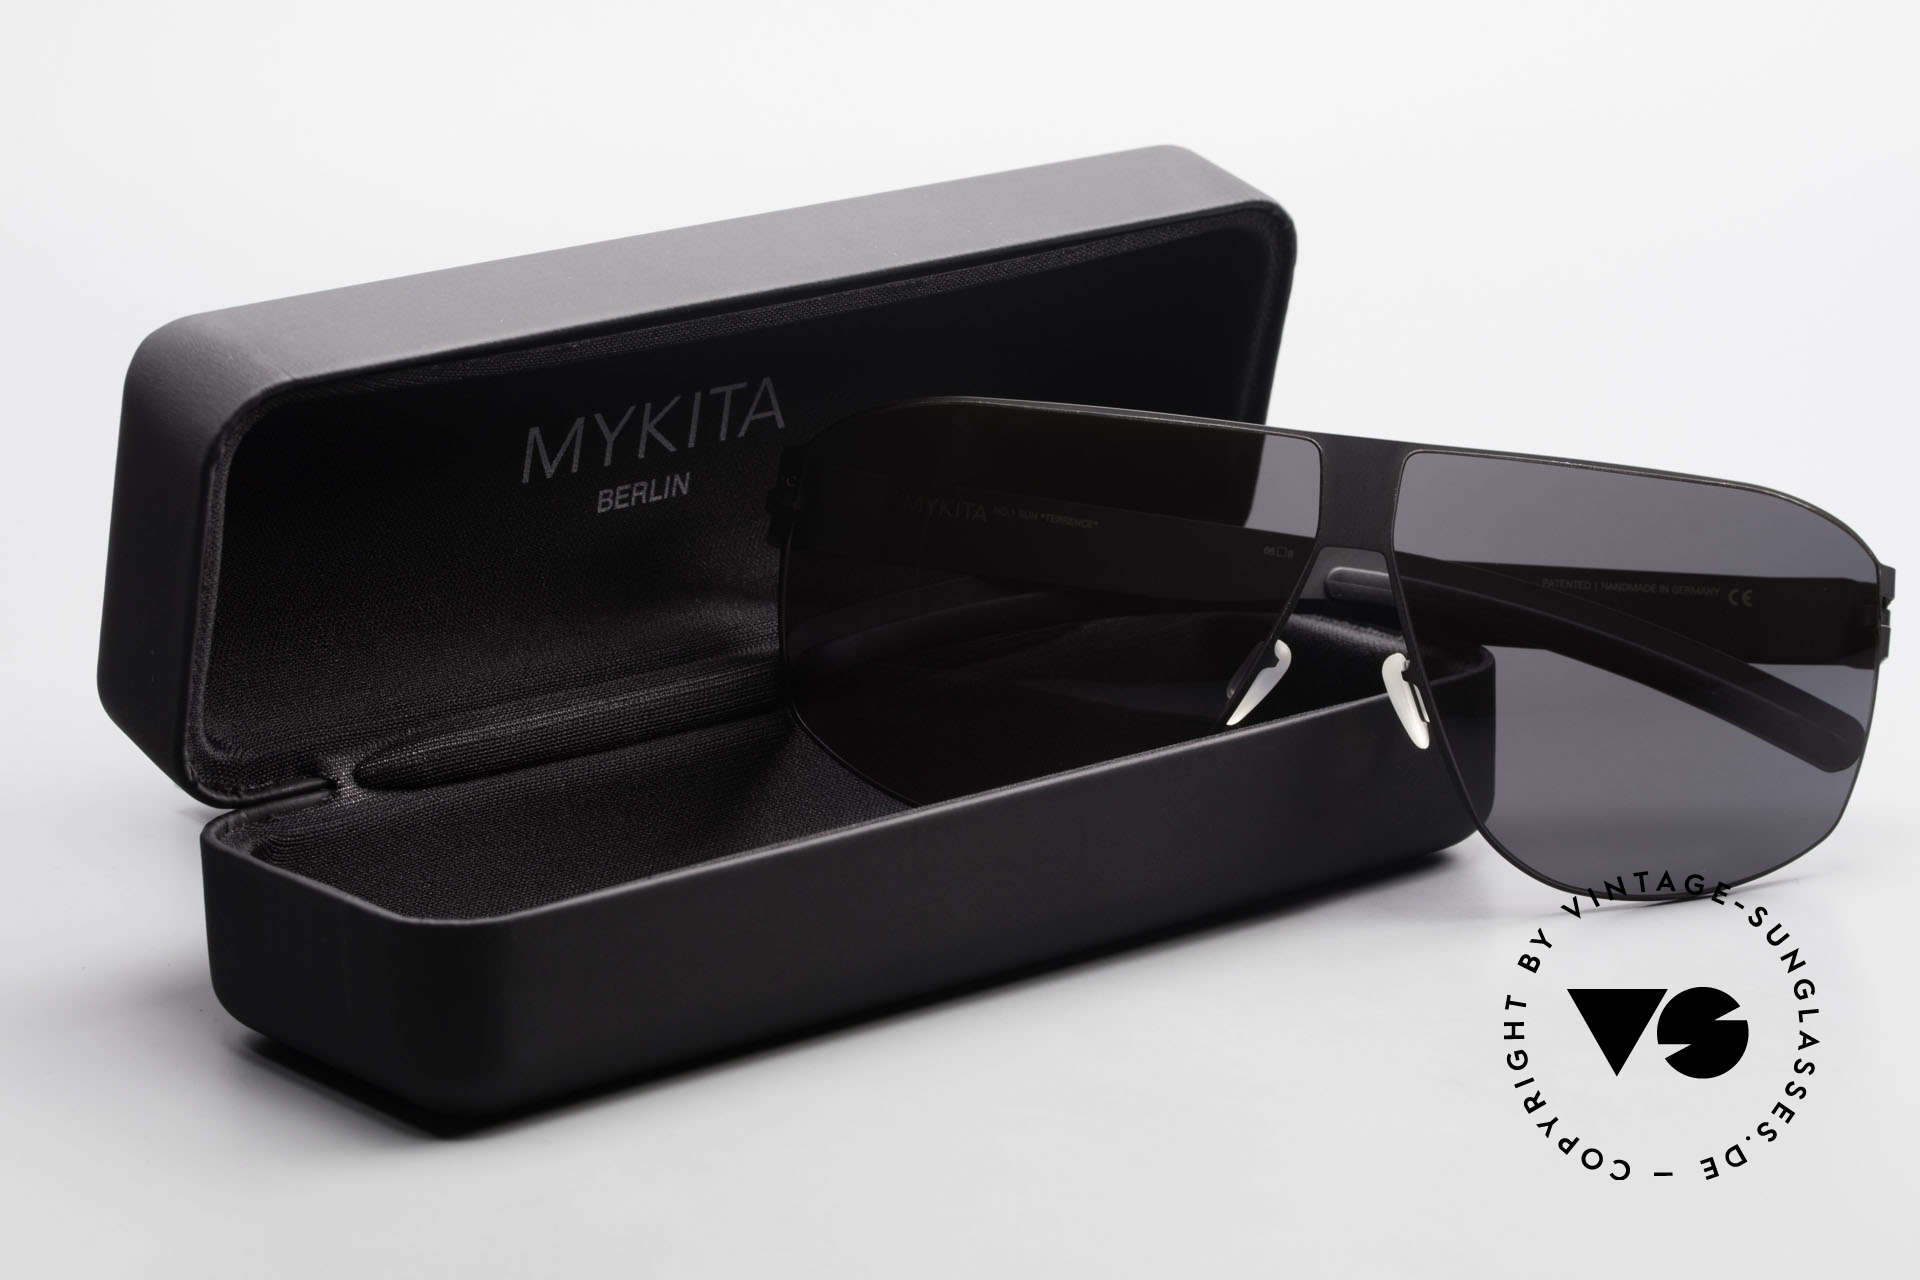 Mykita Terrence Vintage Mykita Sonnenbrille, Größe: large, Passend für Herren